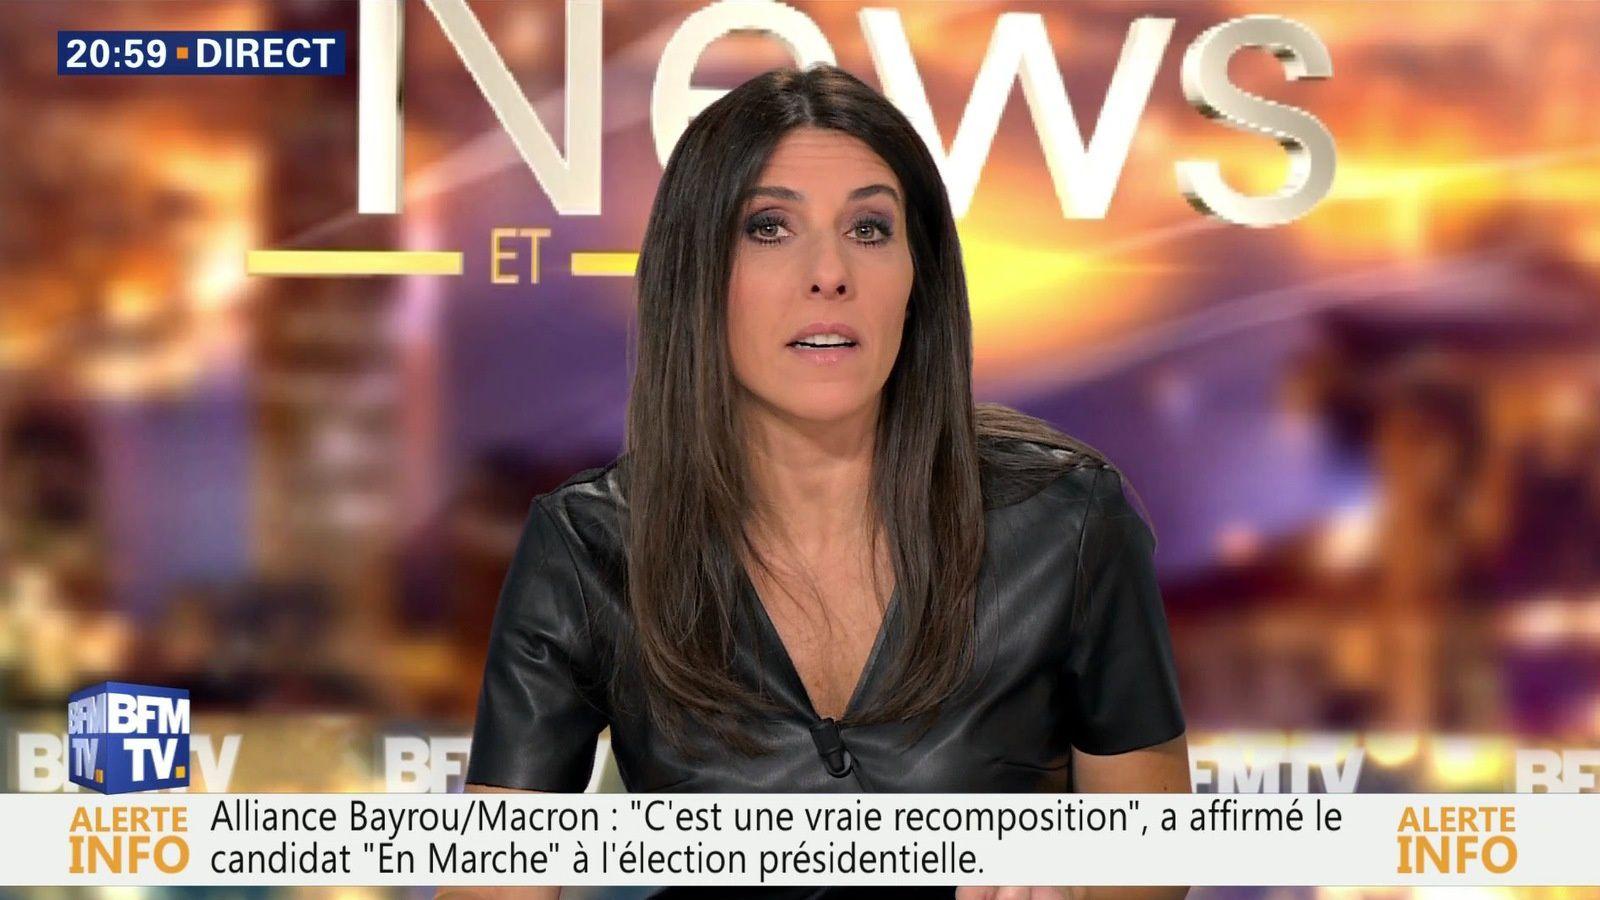 �7 NATHALIE LEVY @NathalieLevyNC @nthl_l @JohannaCarlosD8 ce soir pour #newsetco @bfmtv #vuesalatele